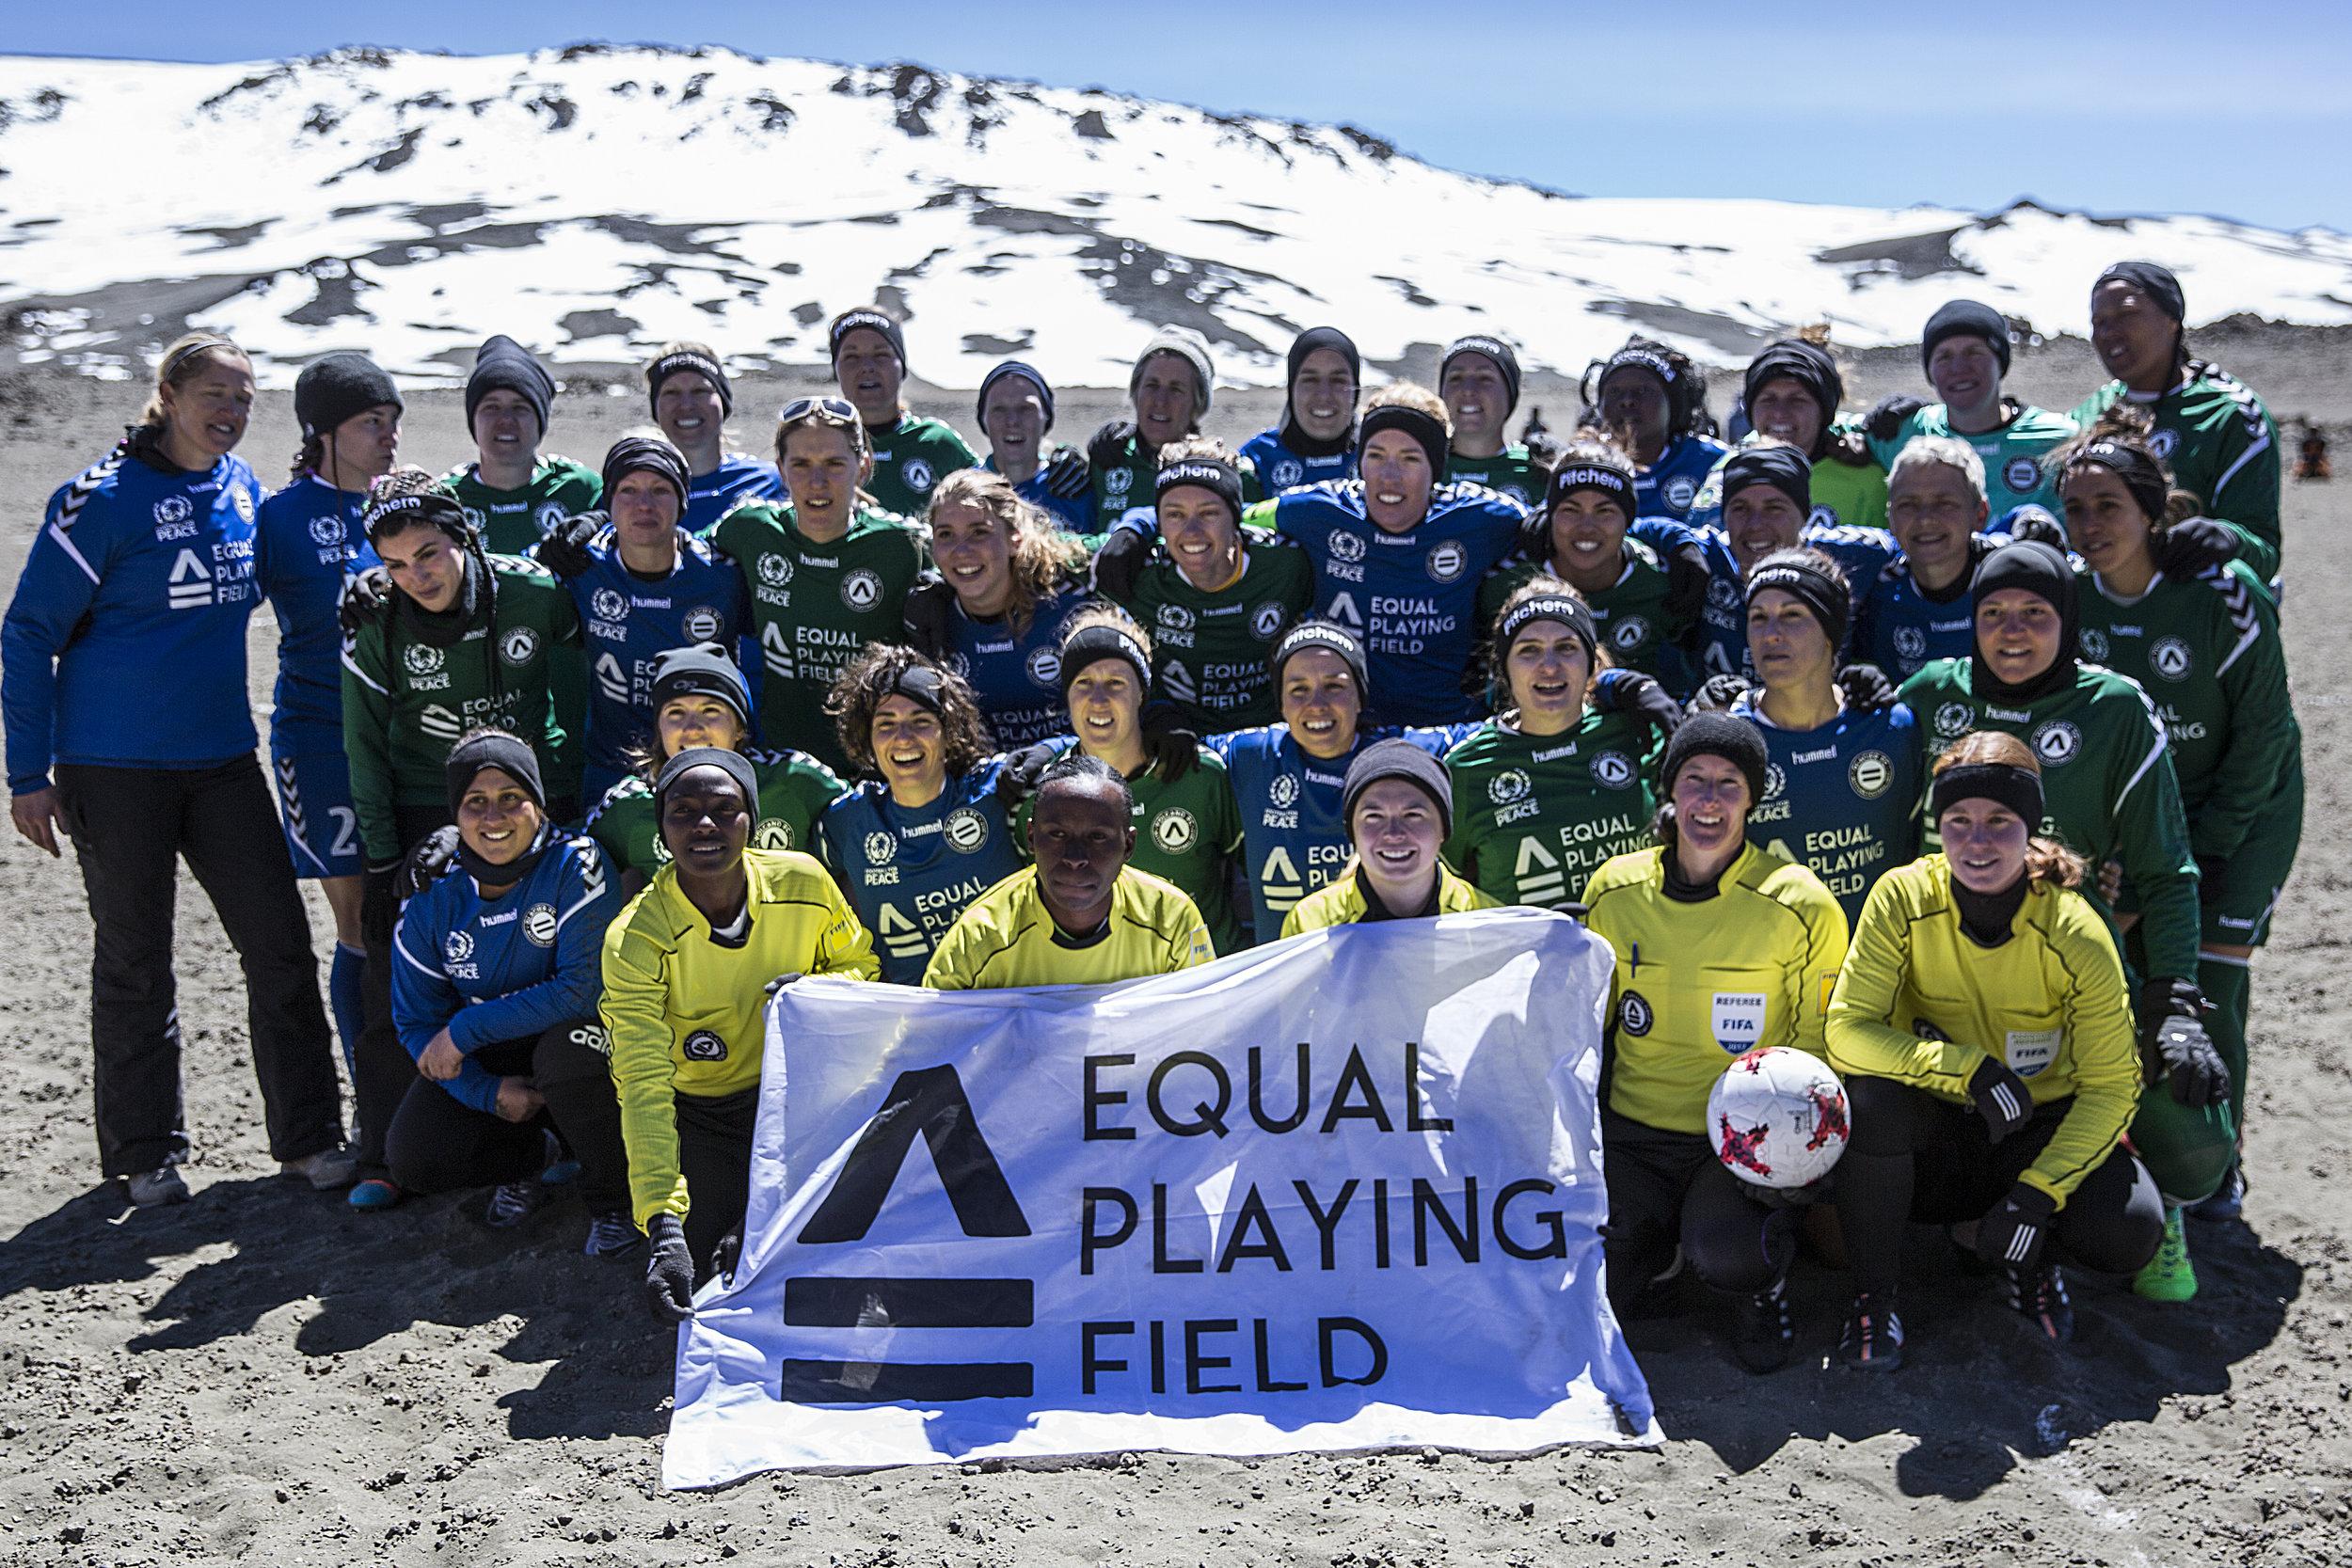 2017 Kili squad with EPF banner.jpg